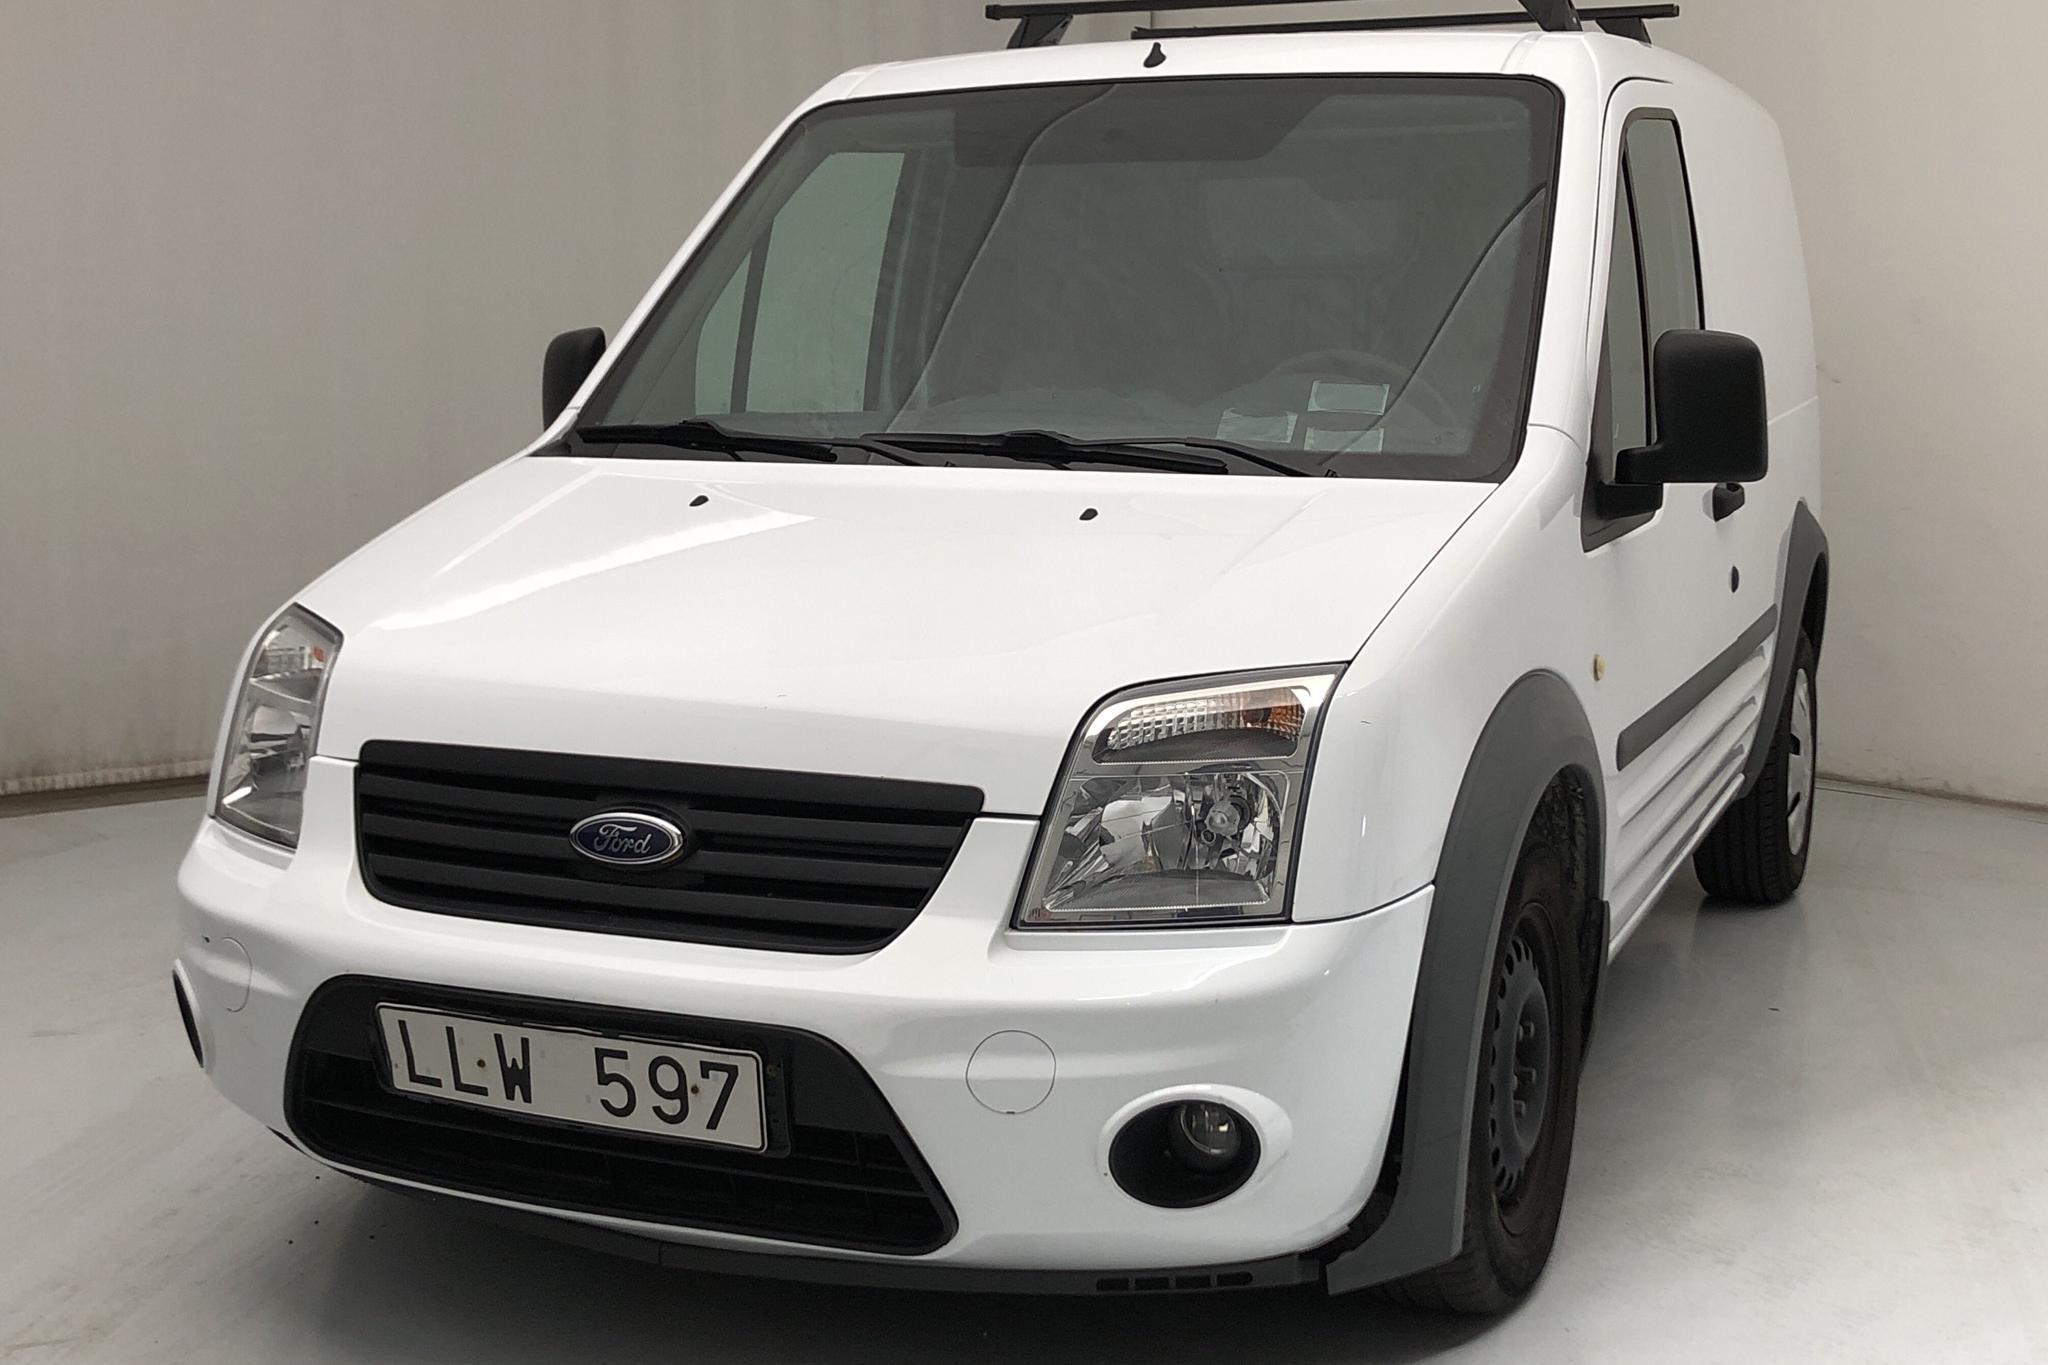 Ford Transit Connect 1.8 TDCi (90hk) - 59 860 km - Manual - white - 2011